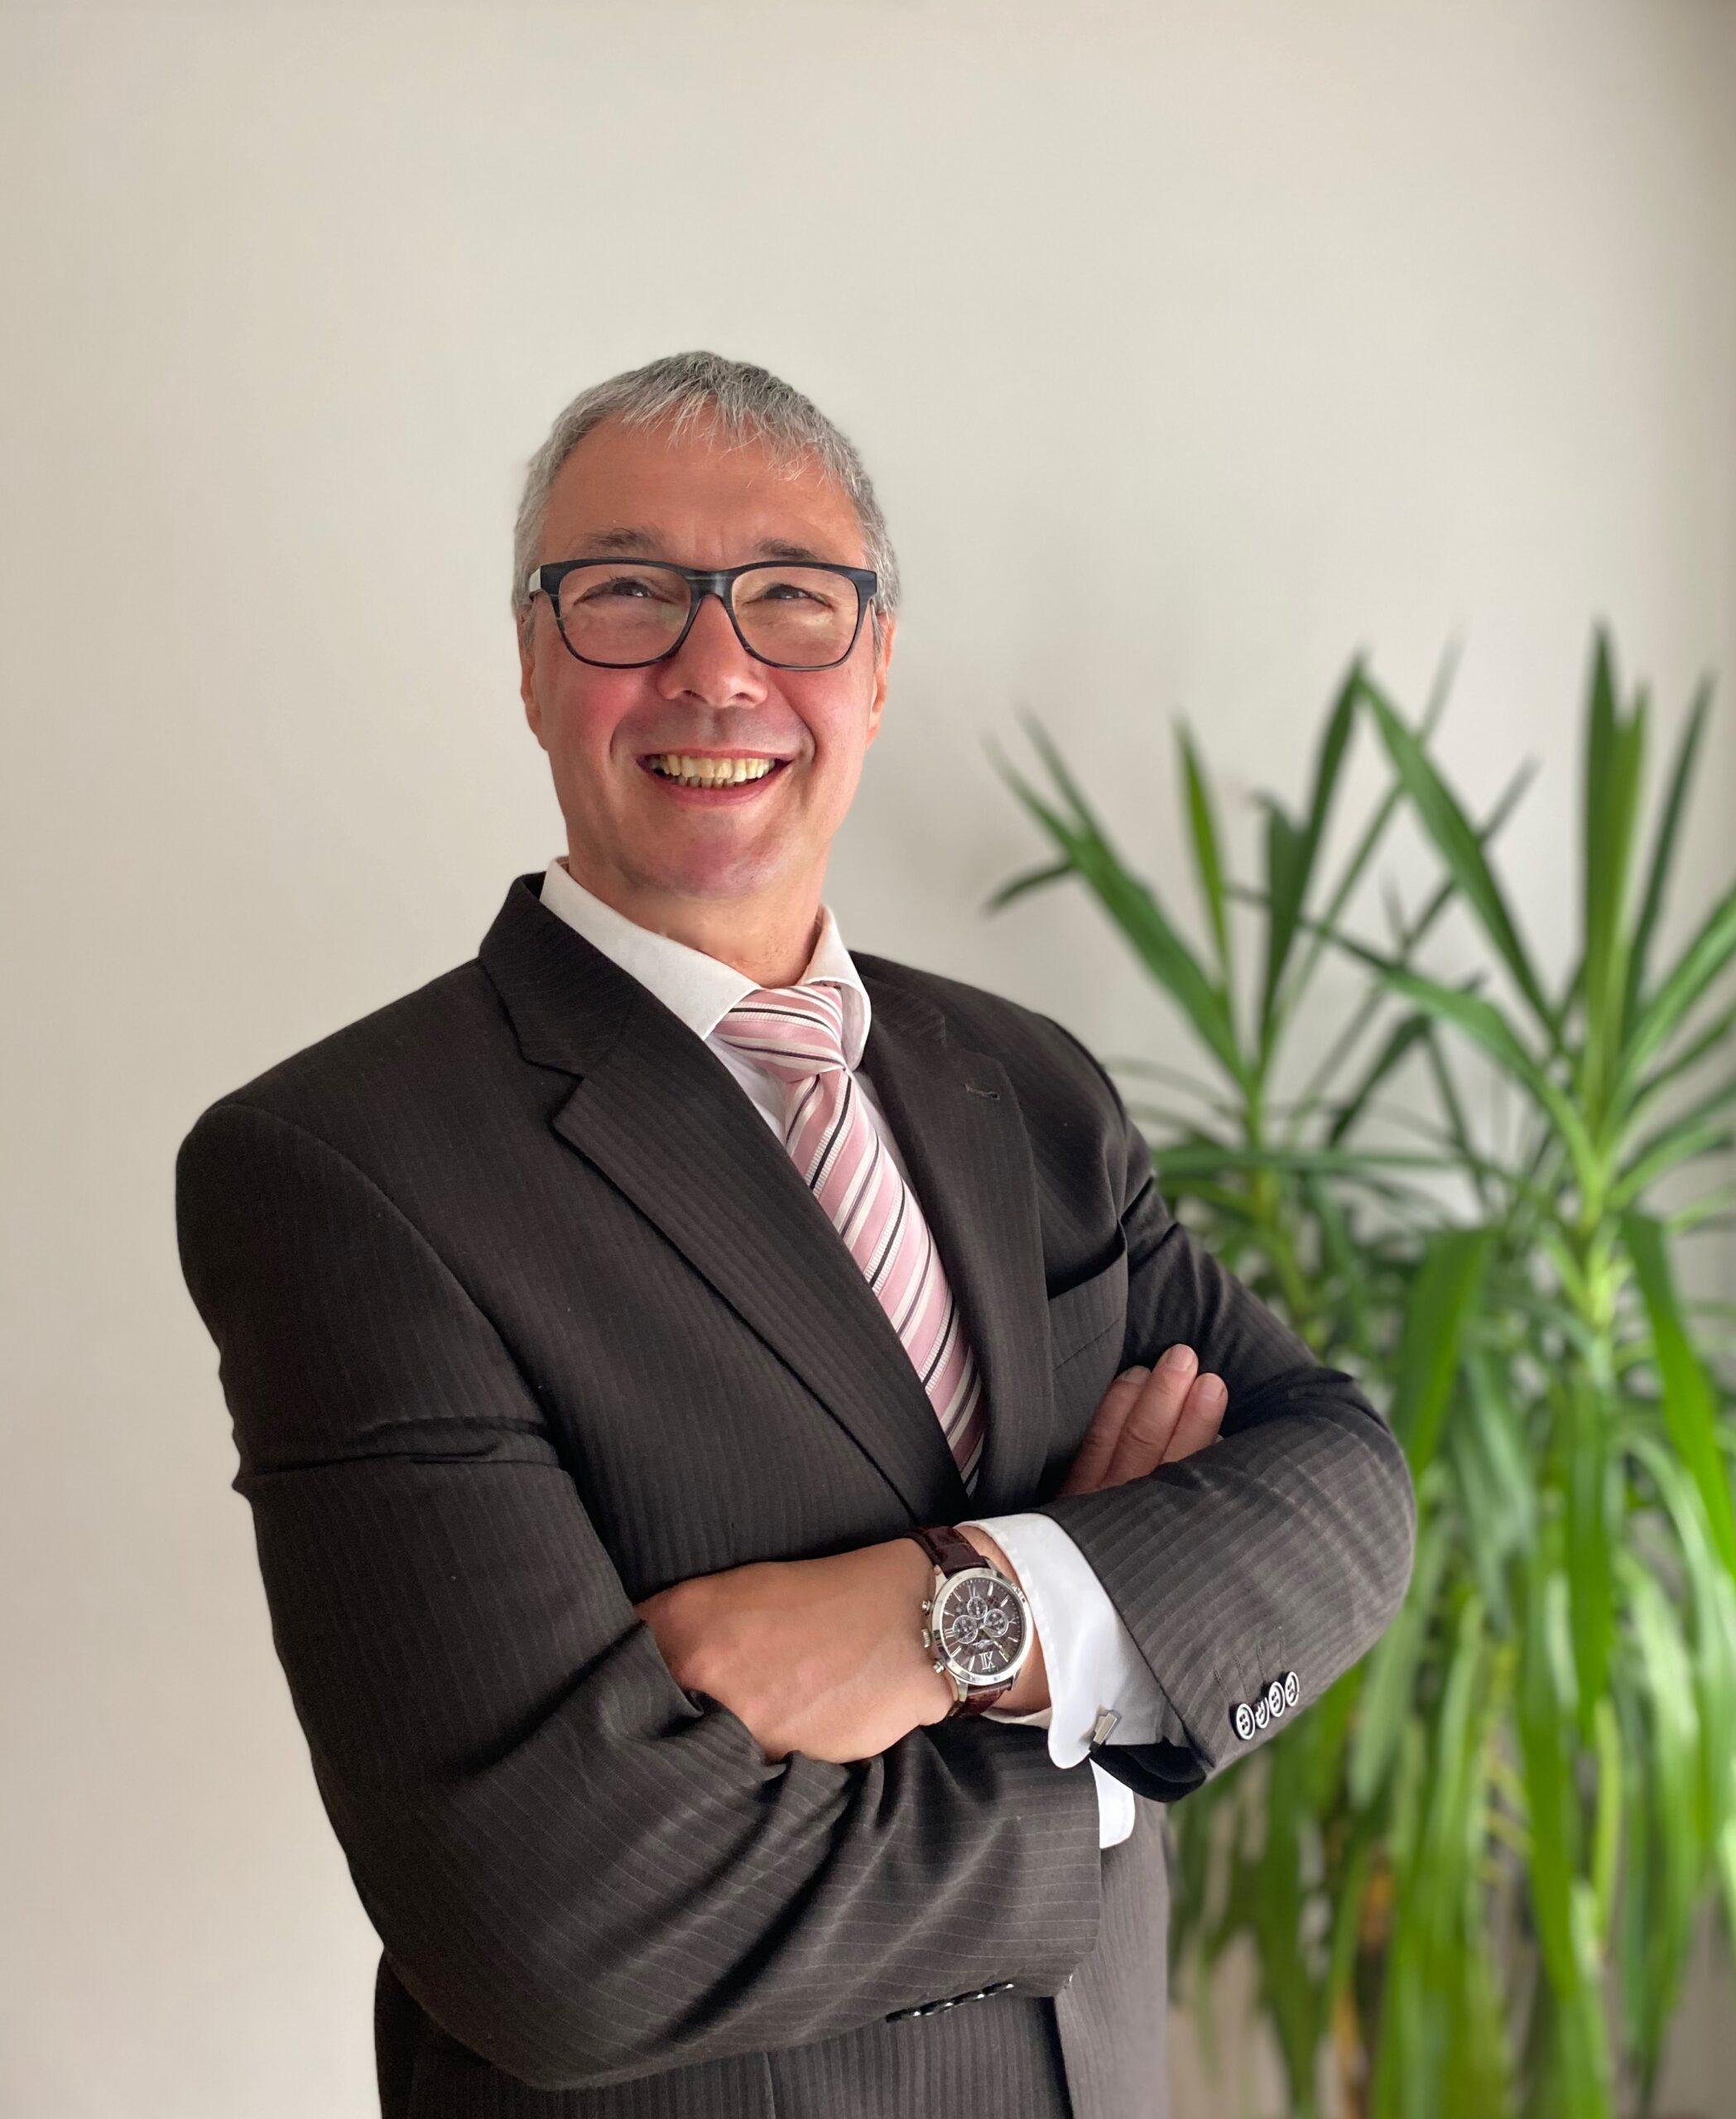 XING Experte seit 2004 - Markus Tonn